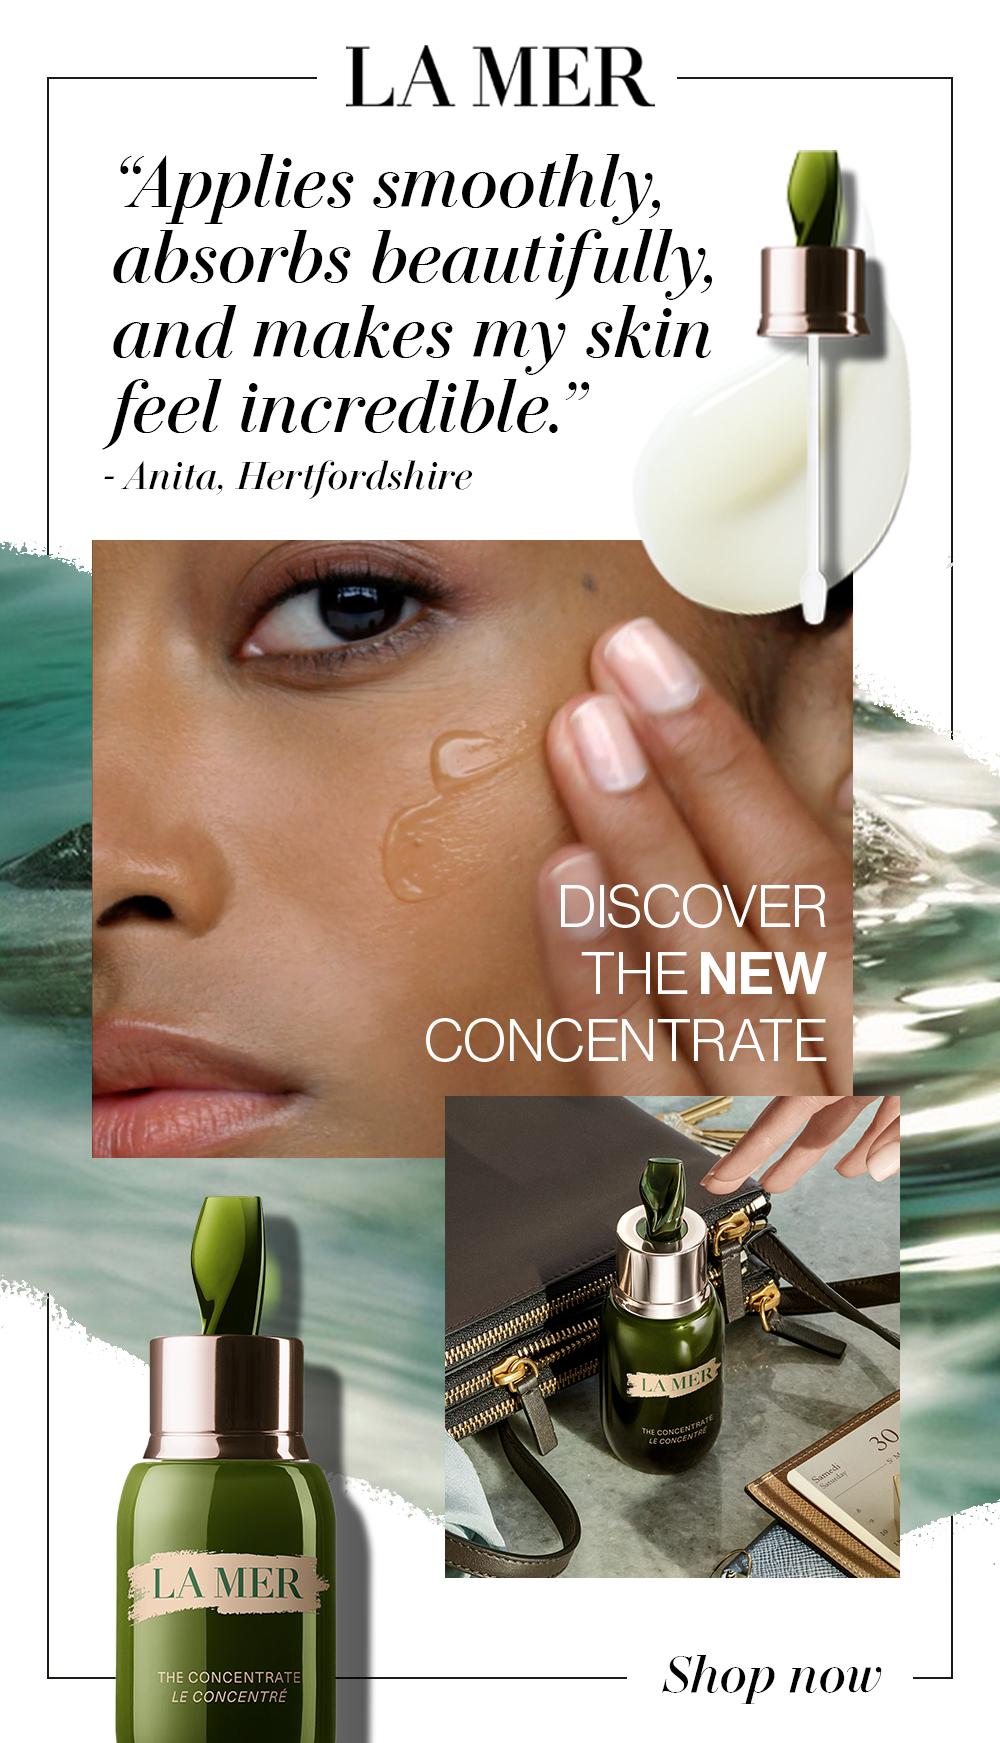 The Concentrate Skin Serum La Mer Uk In 2020 Skin Serum Makeup Skin Care Homemade Beauty Tips